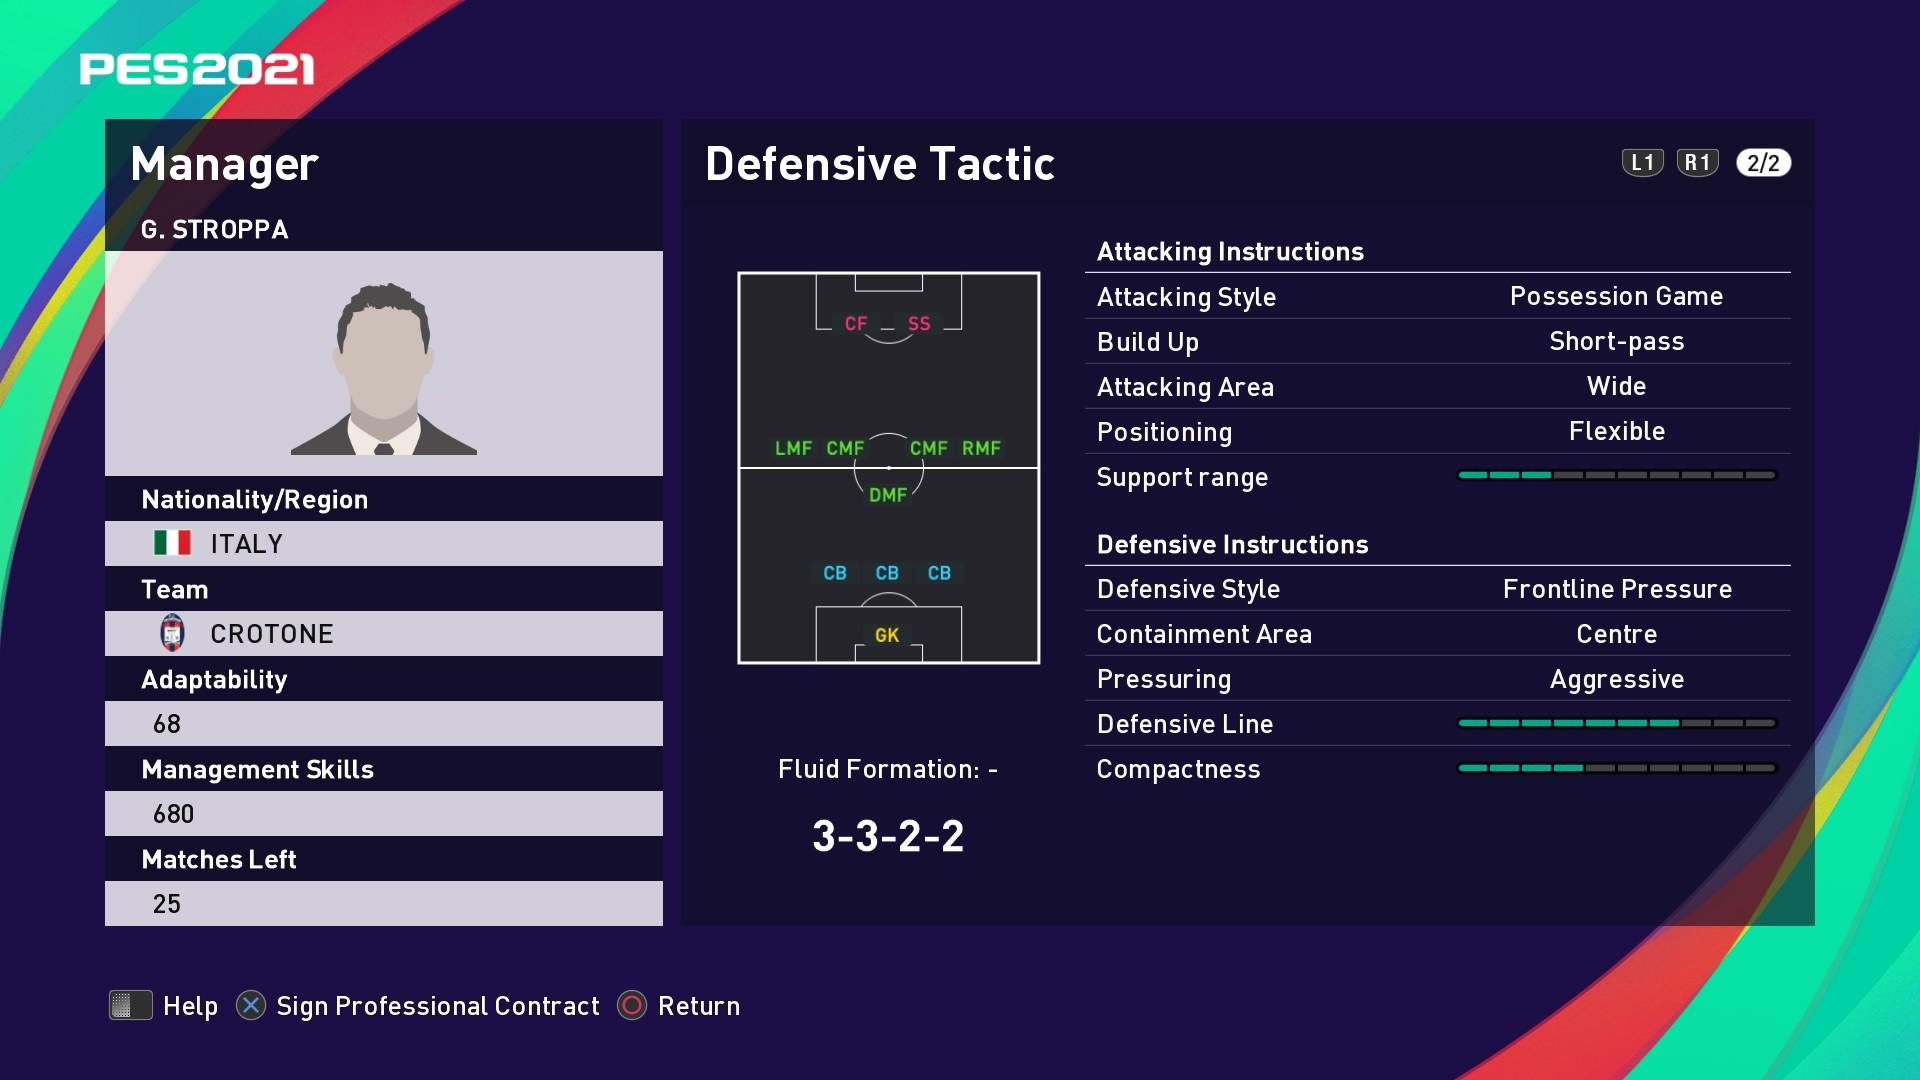 G. Stroppa (Giovanni Stroppa) Defensive Tactic in PES 2021 myClub